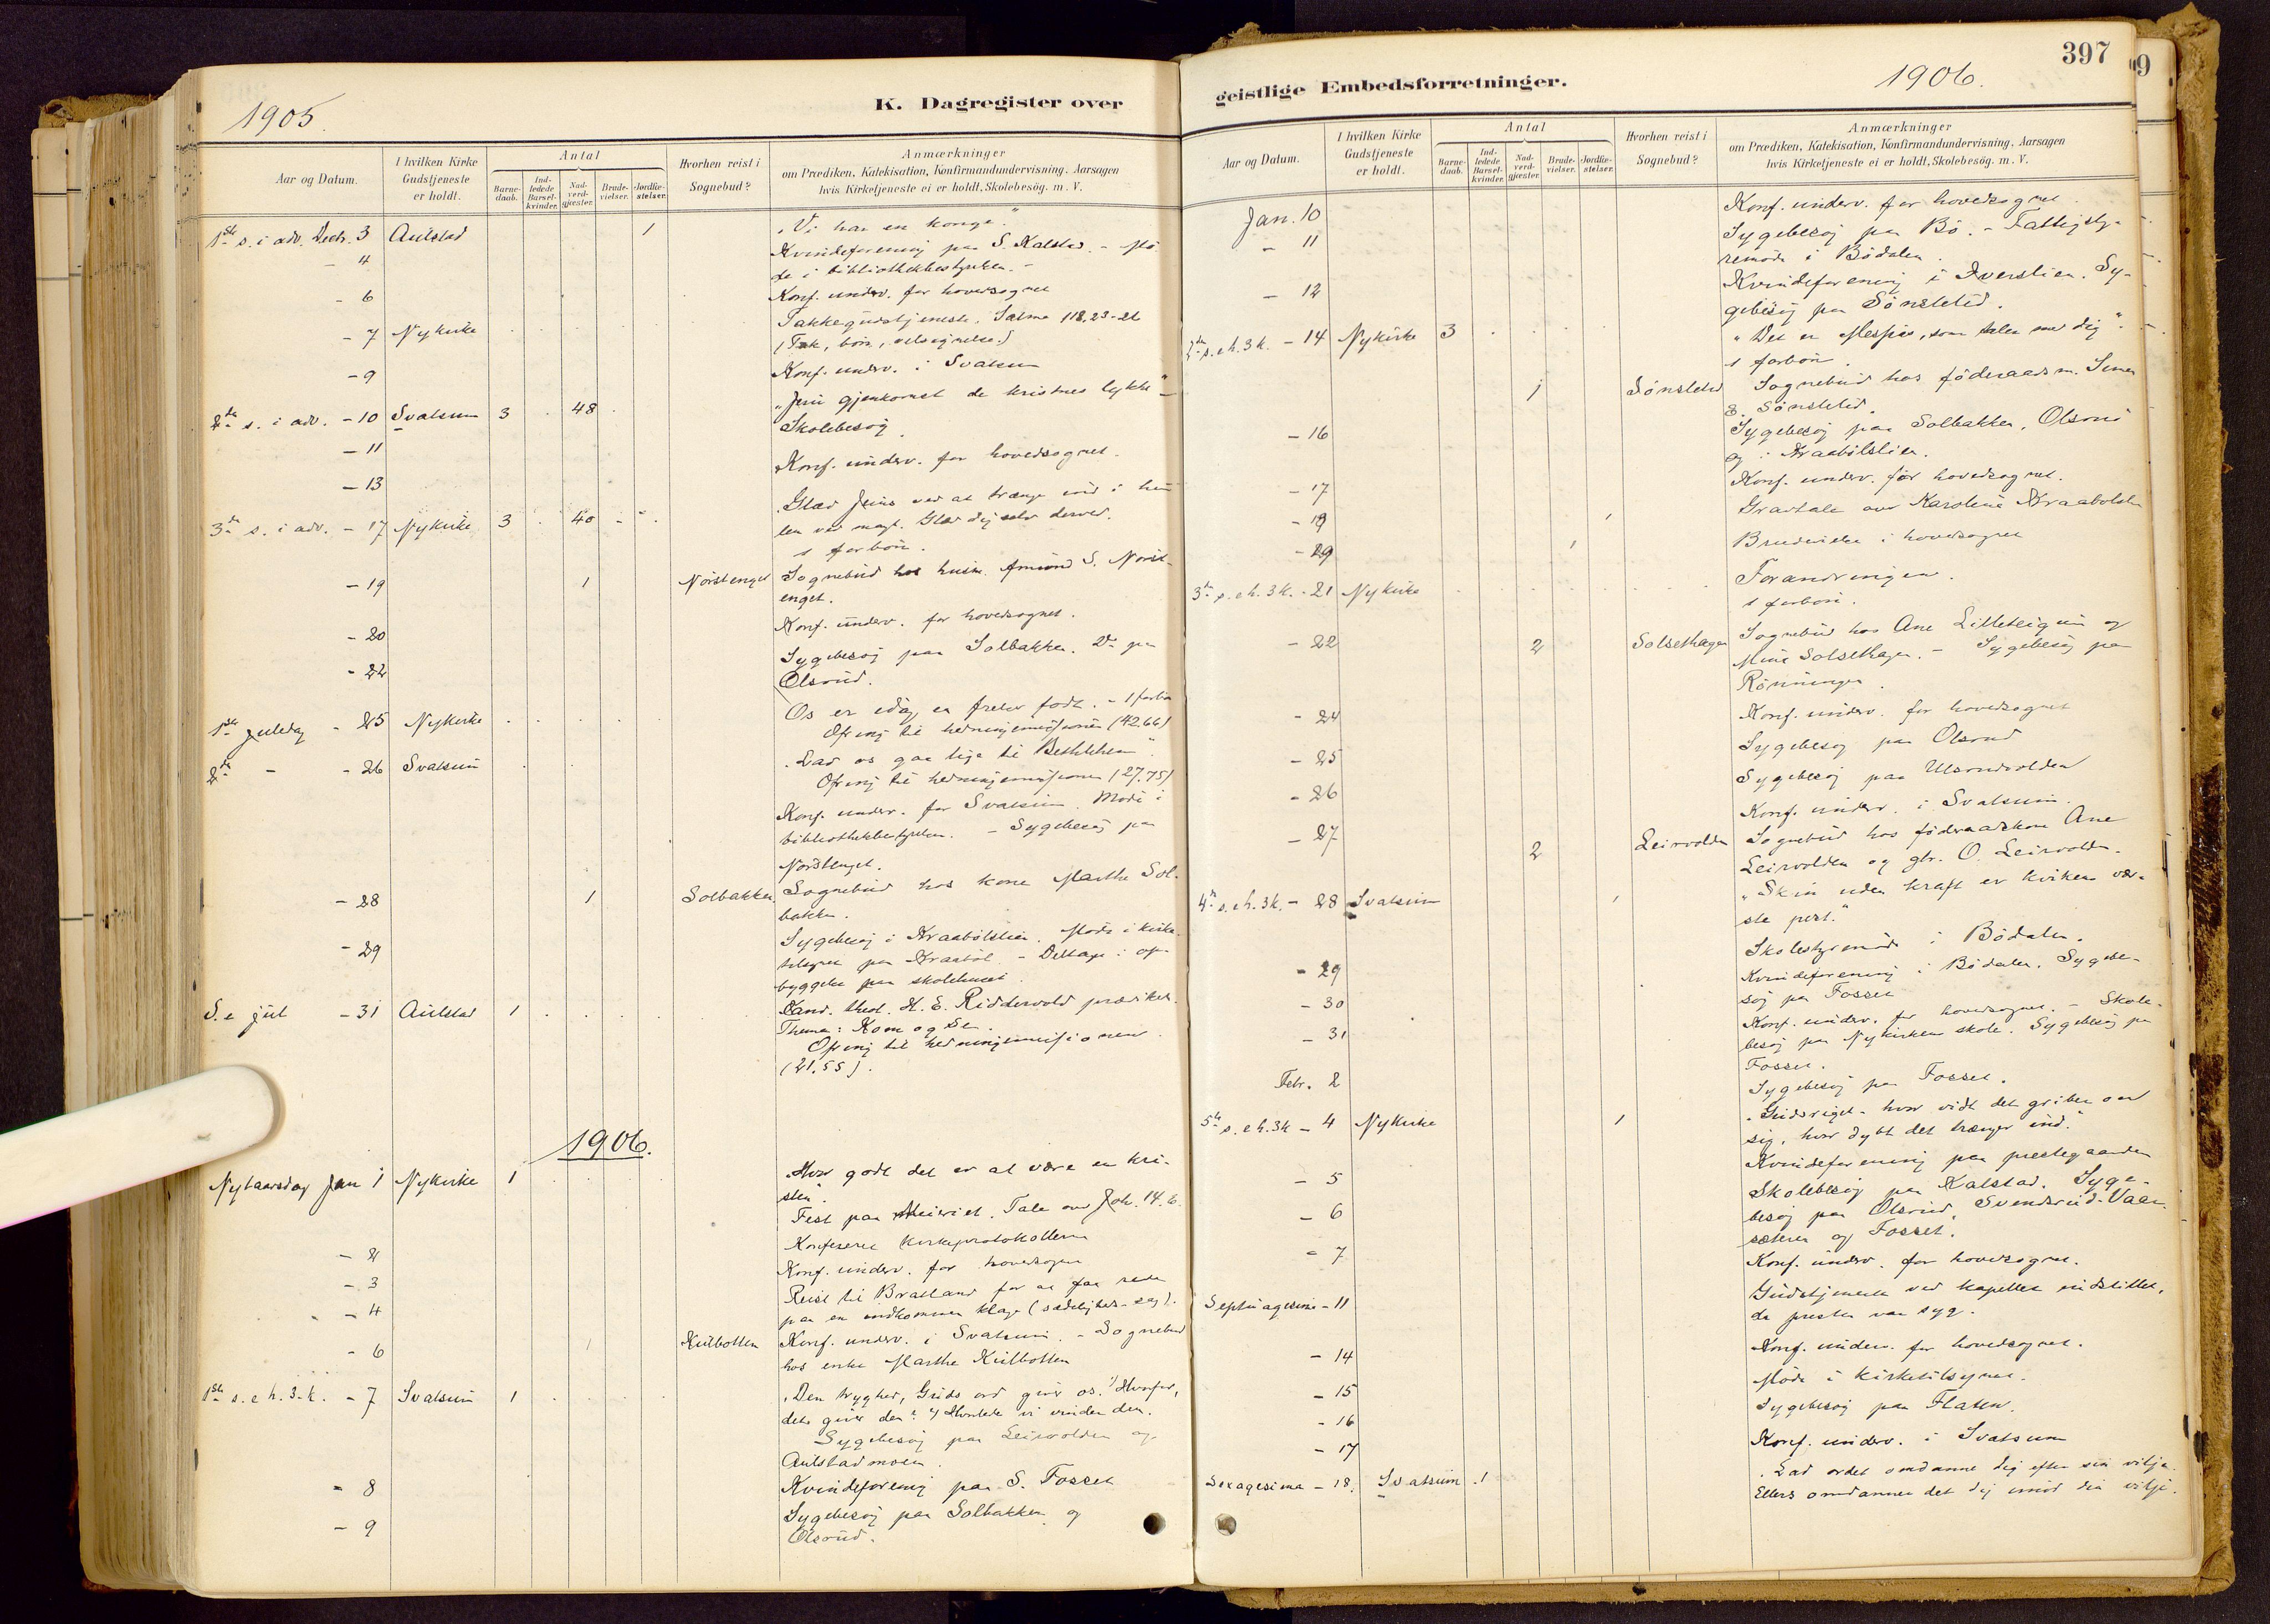 SAH, Vestre Gausdal prestekontor, Ministerialbok nr. 1, 1887-1914, s. 397